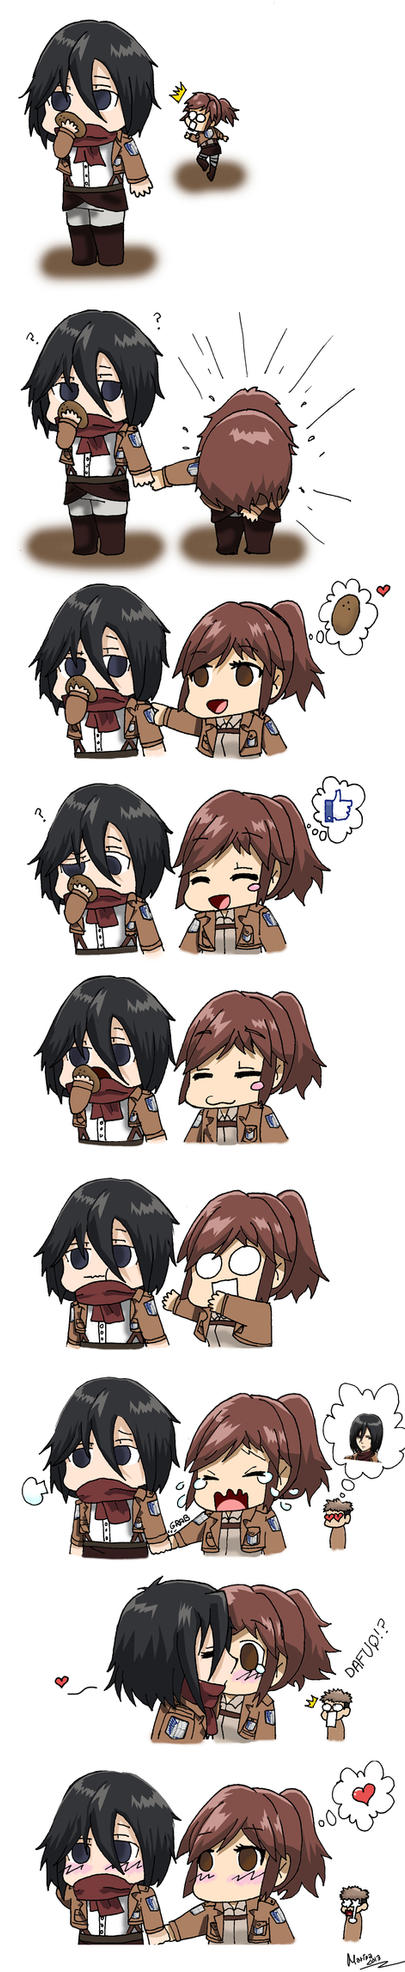 Shingeki no Kyojin(Attack on Titan) - Page 6 Give_me_that_potato__mikasa_x_sasha__by_mrne93-d6pxh1t